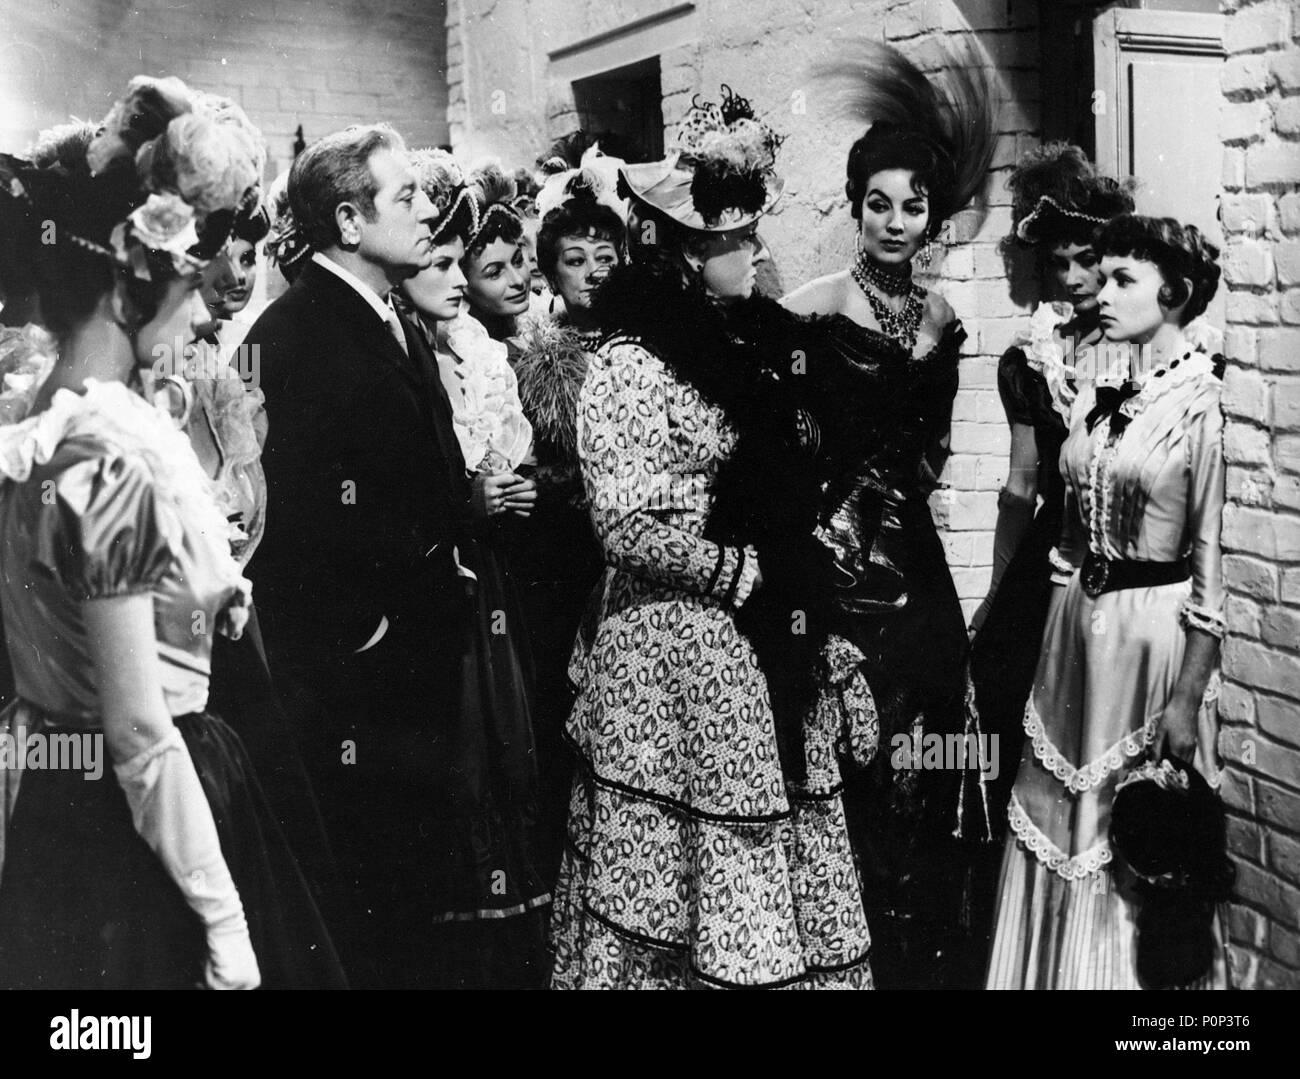 English Title: FRENCH CANCAN. Film Director: JEAN RENOIR. Year: 1954.  Stars: JEAN GABIN; MARIA FELIX. Credit: FRANCO LONDON FILMS / Album